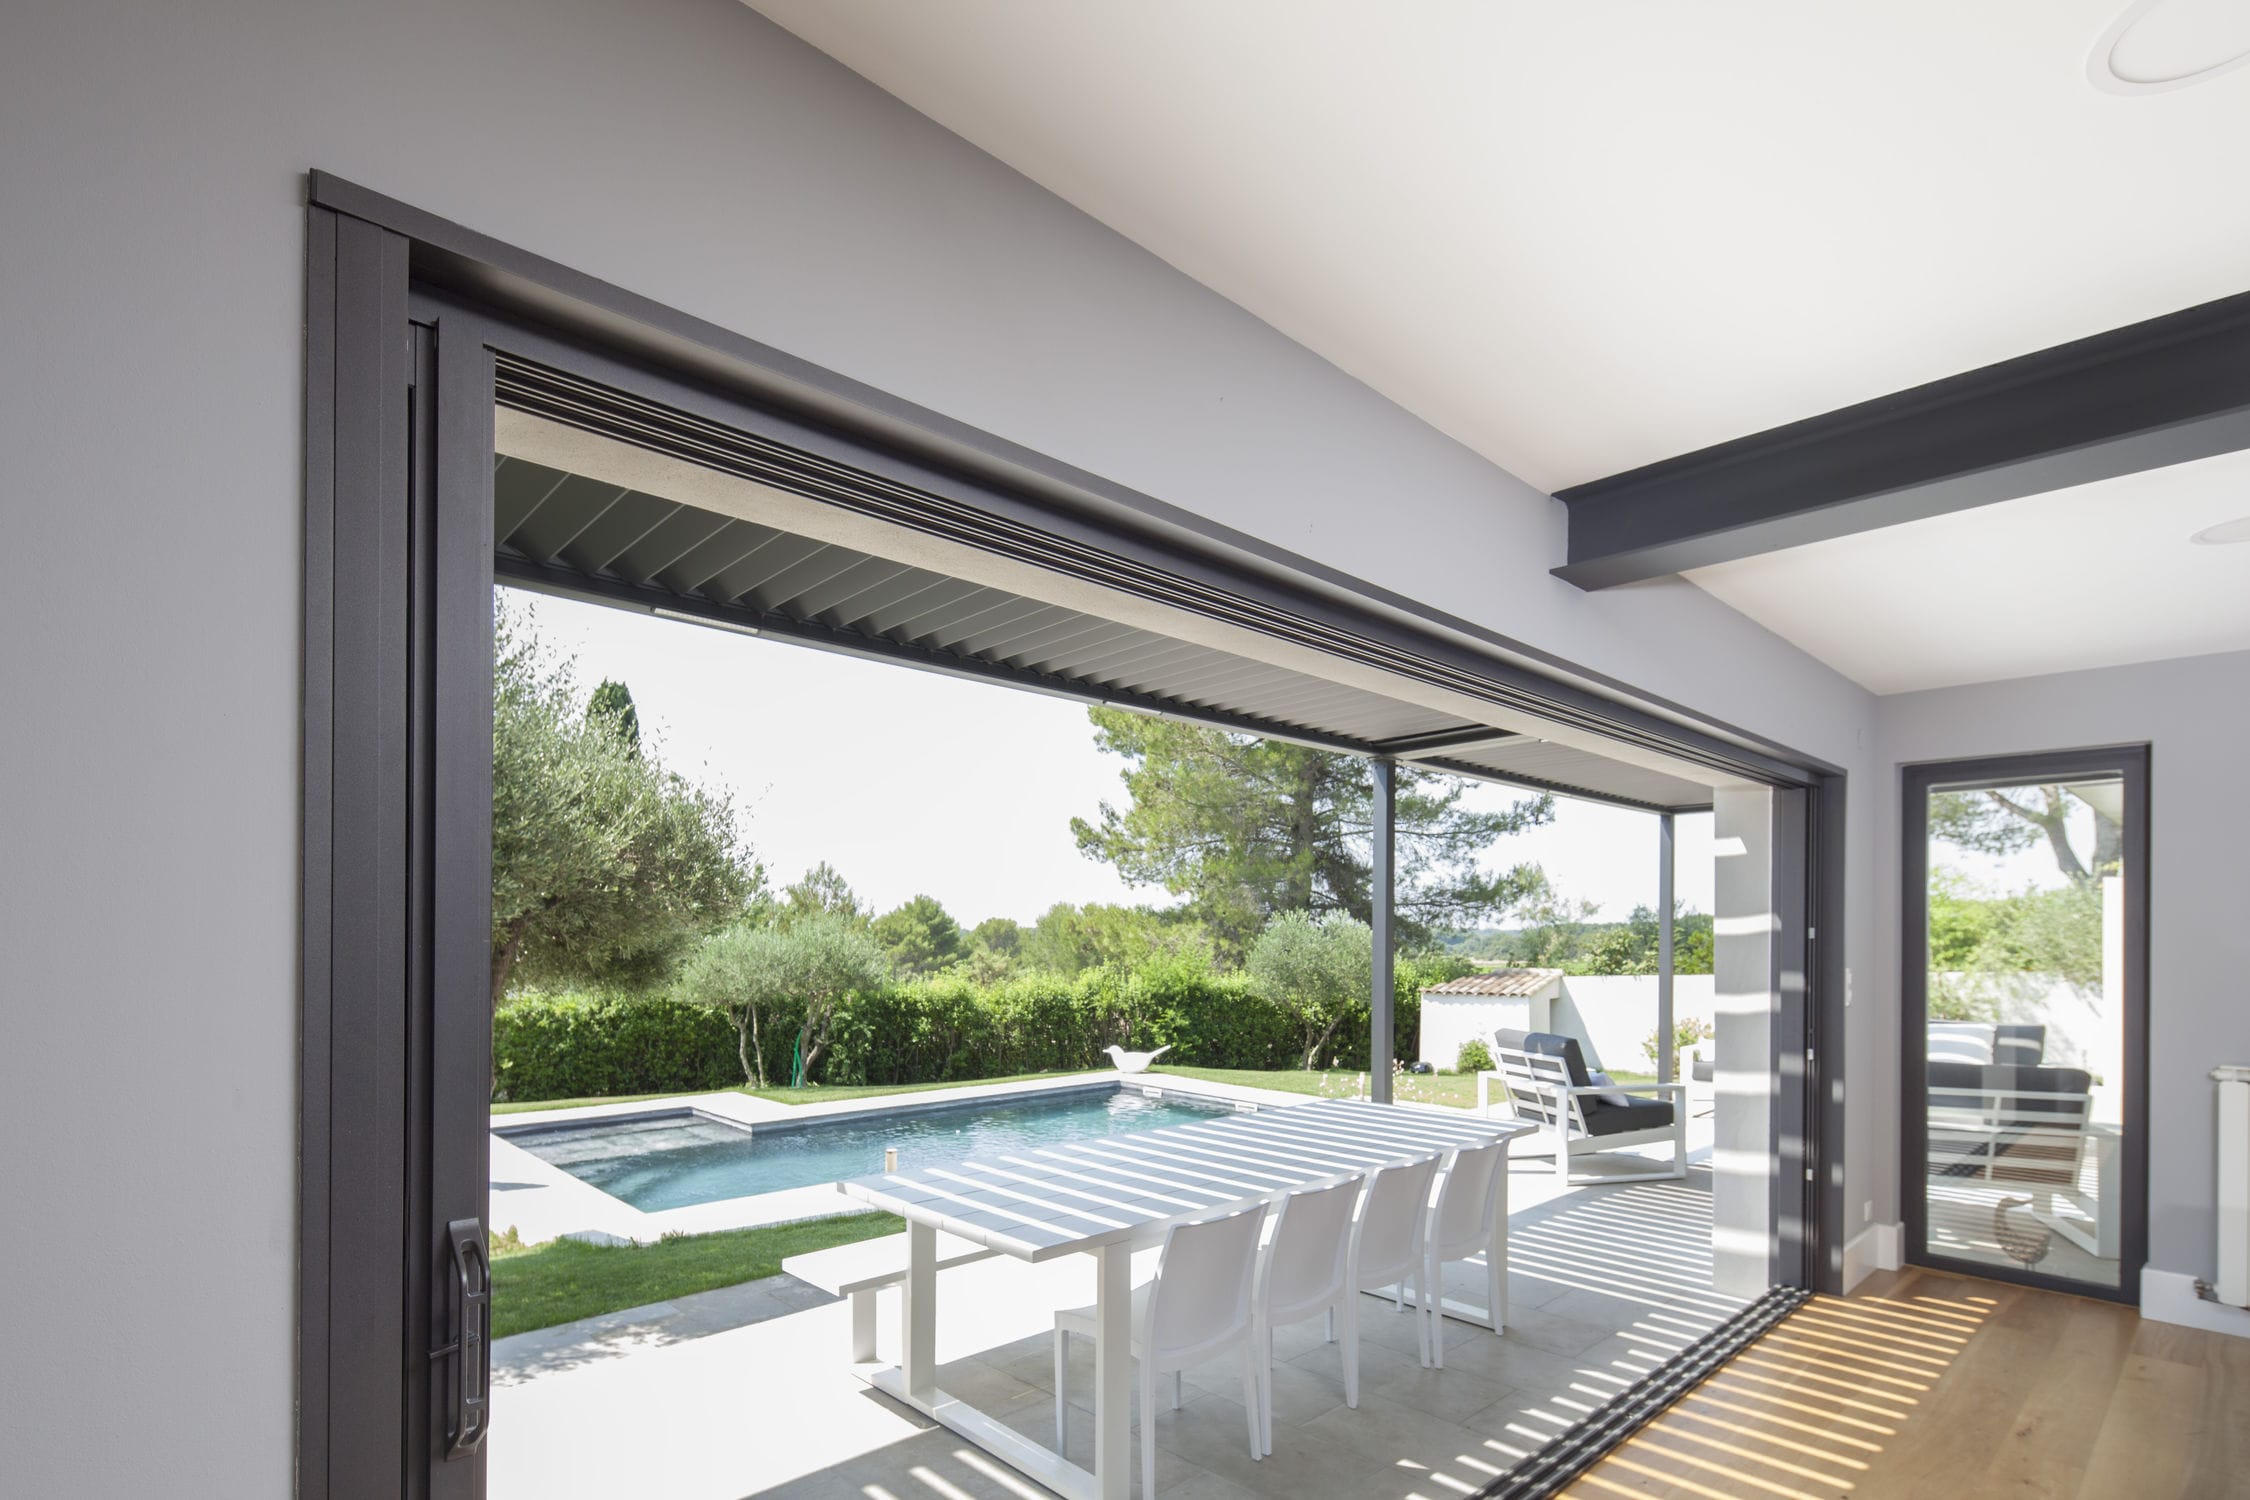 Sliding Patio Door Aluminum Double Glazed Triple Glazed